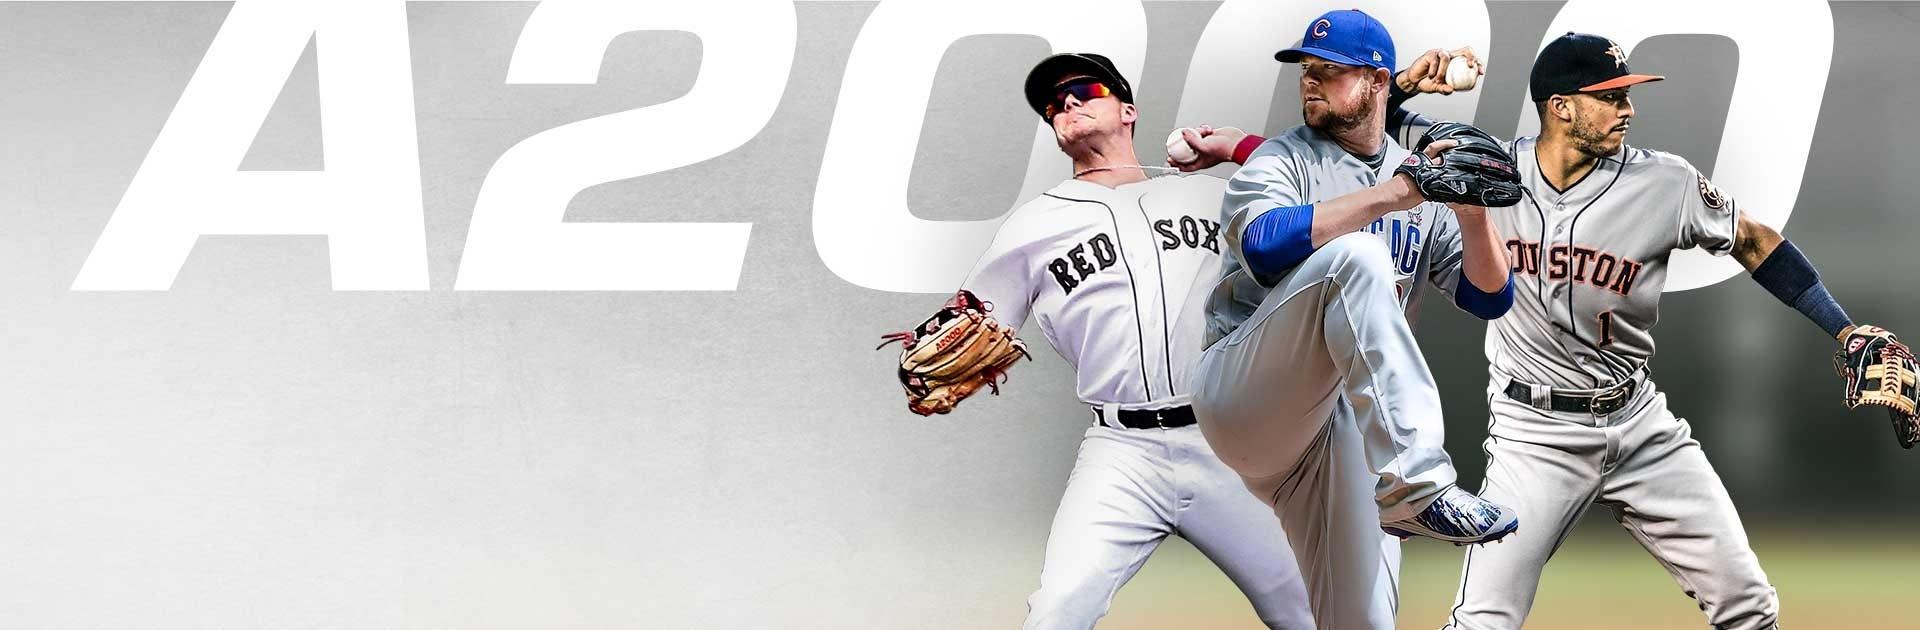 2019 A2000 Baseball Gloves